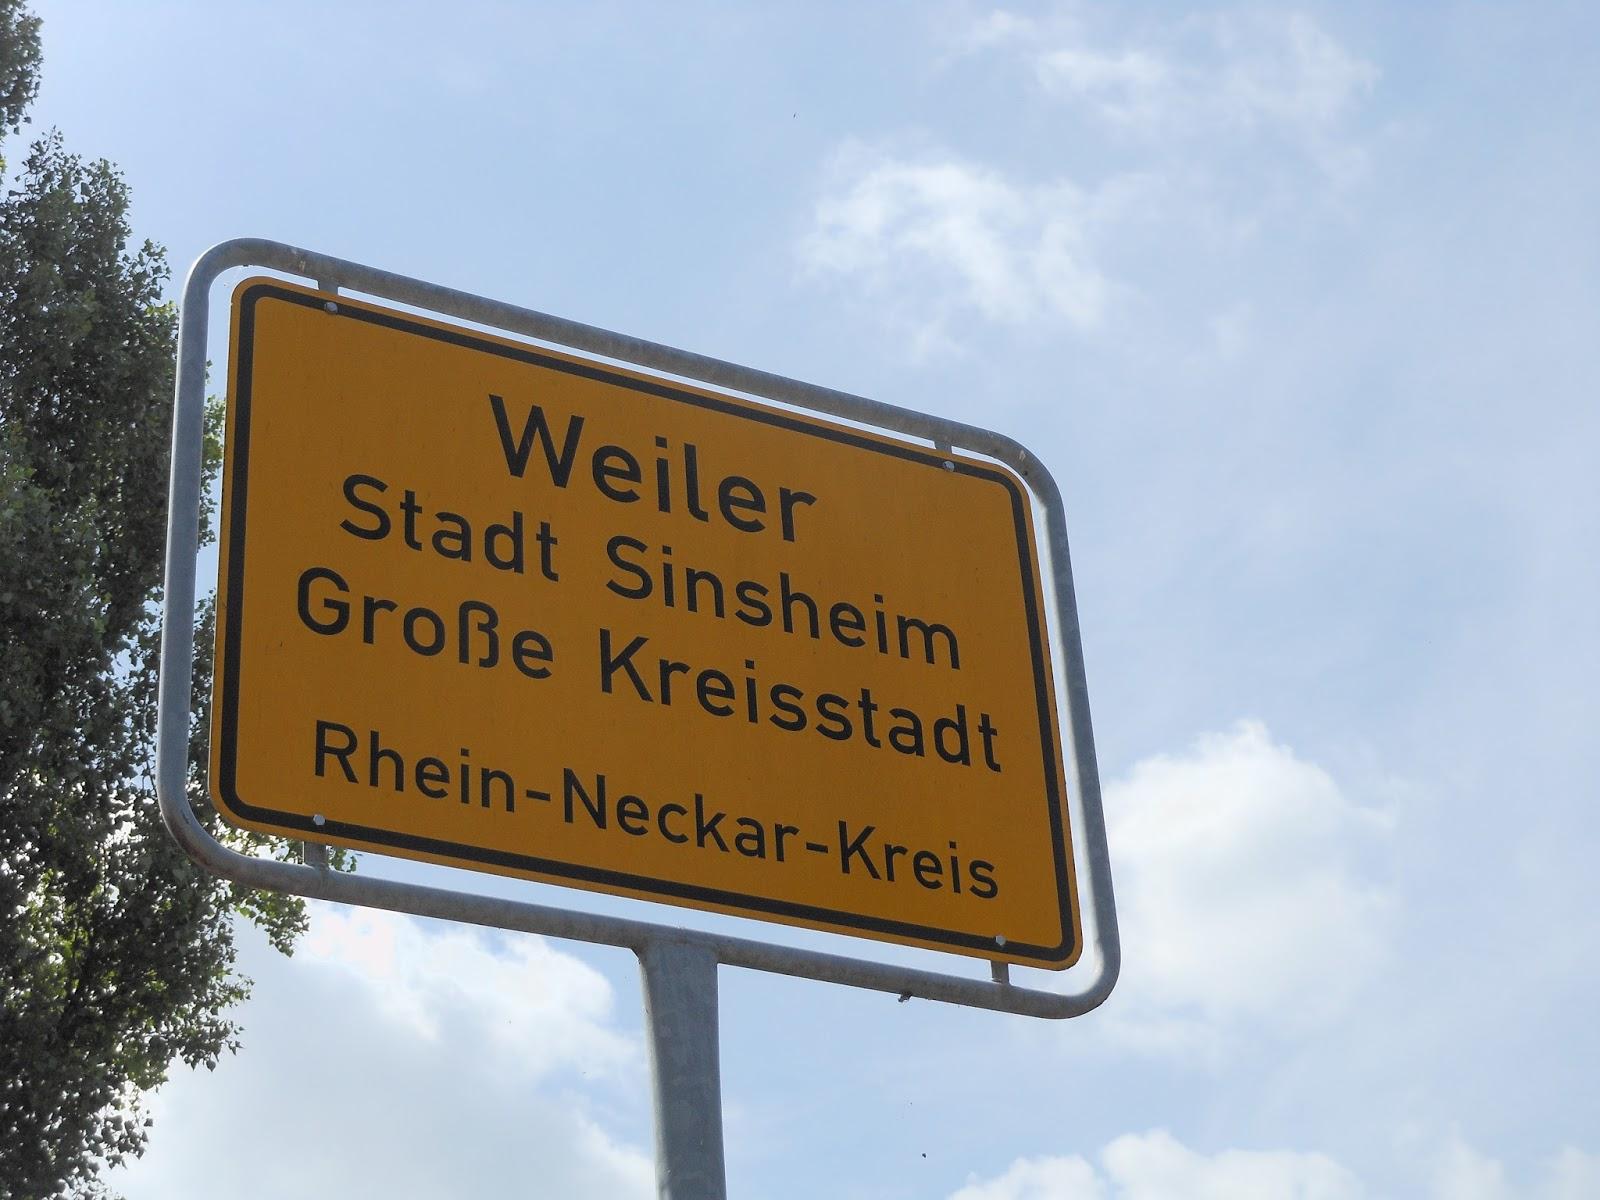 friedhof guntersblum adresse